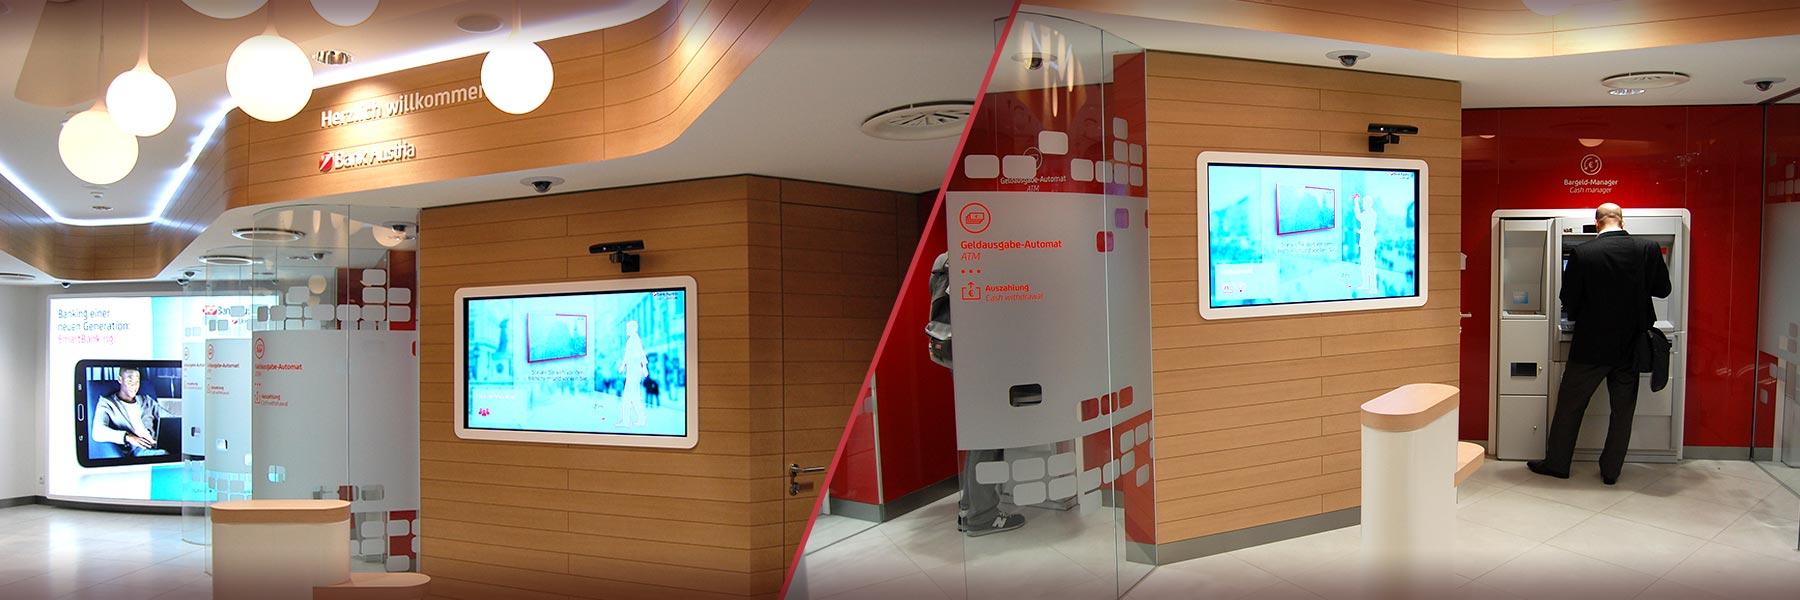 Bank Austria headquarters picture 1 - Foto 1 de la sede de Bank Austria